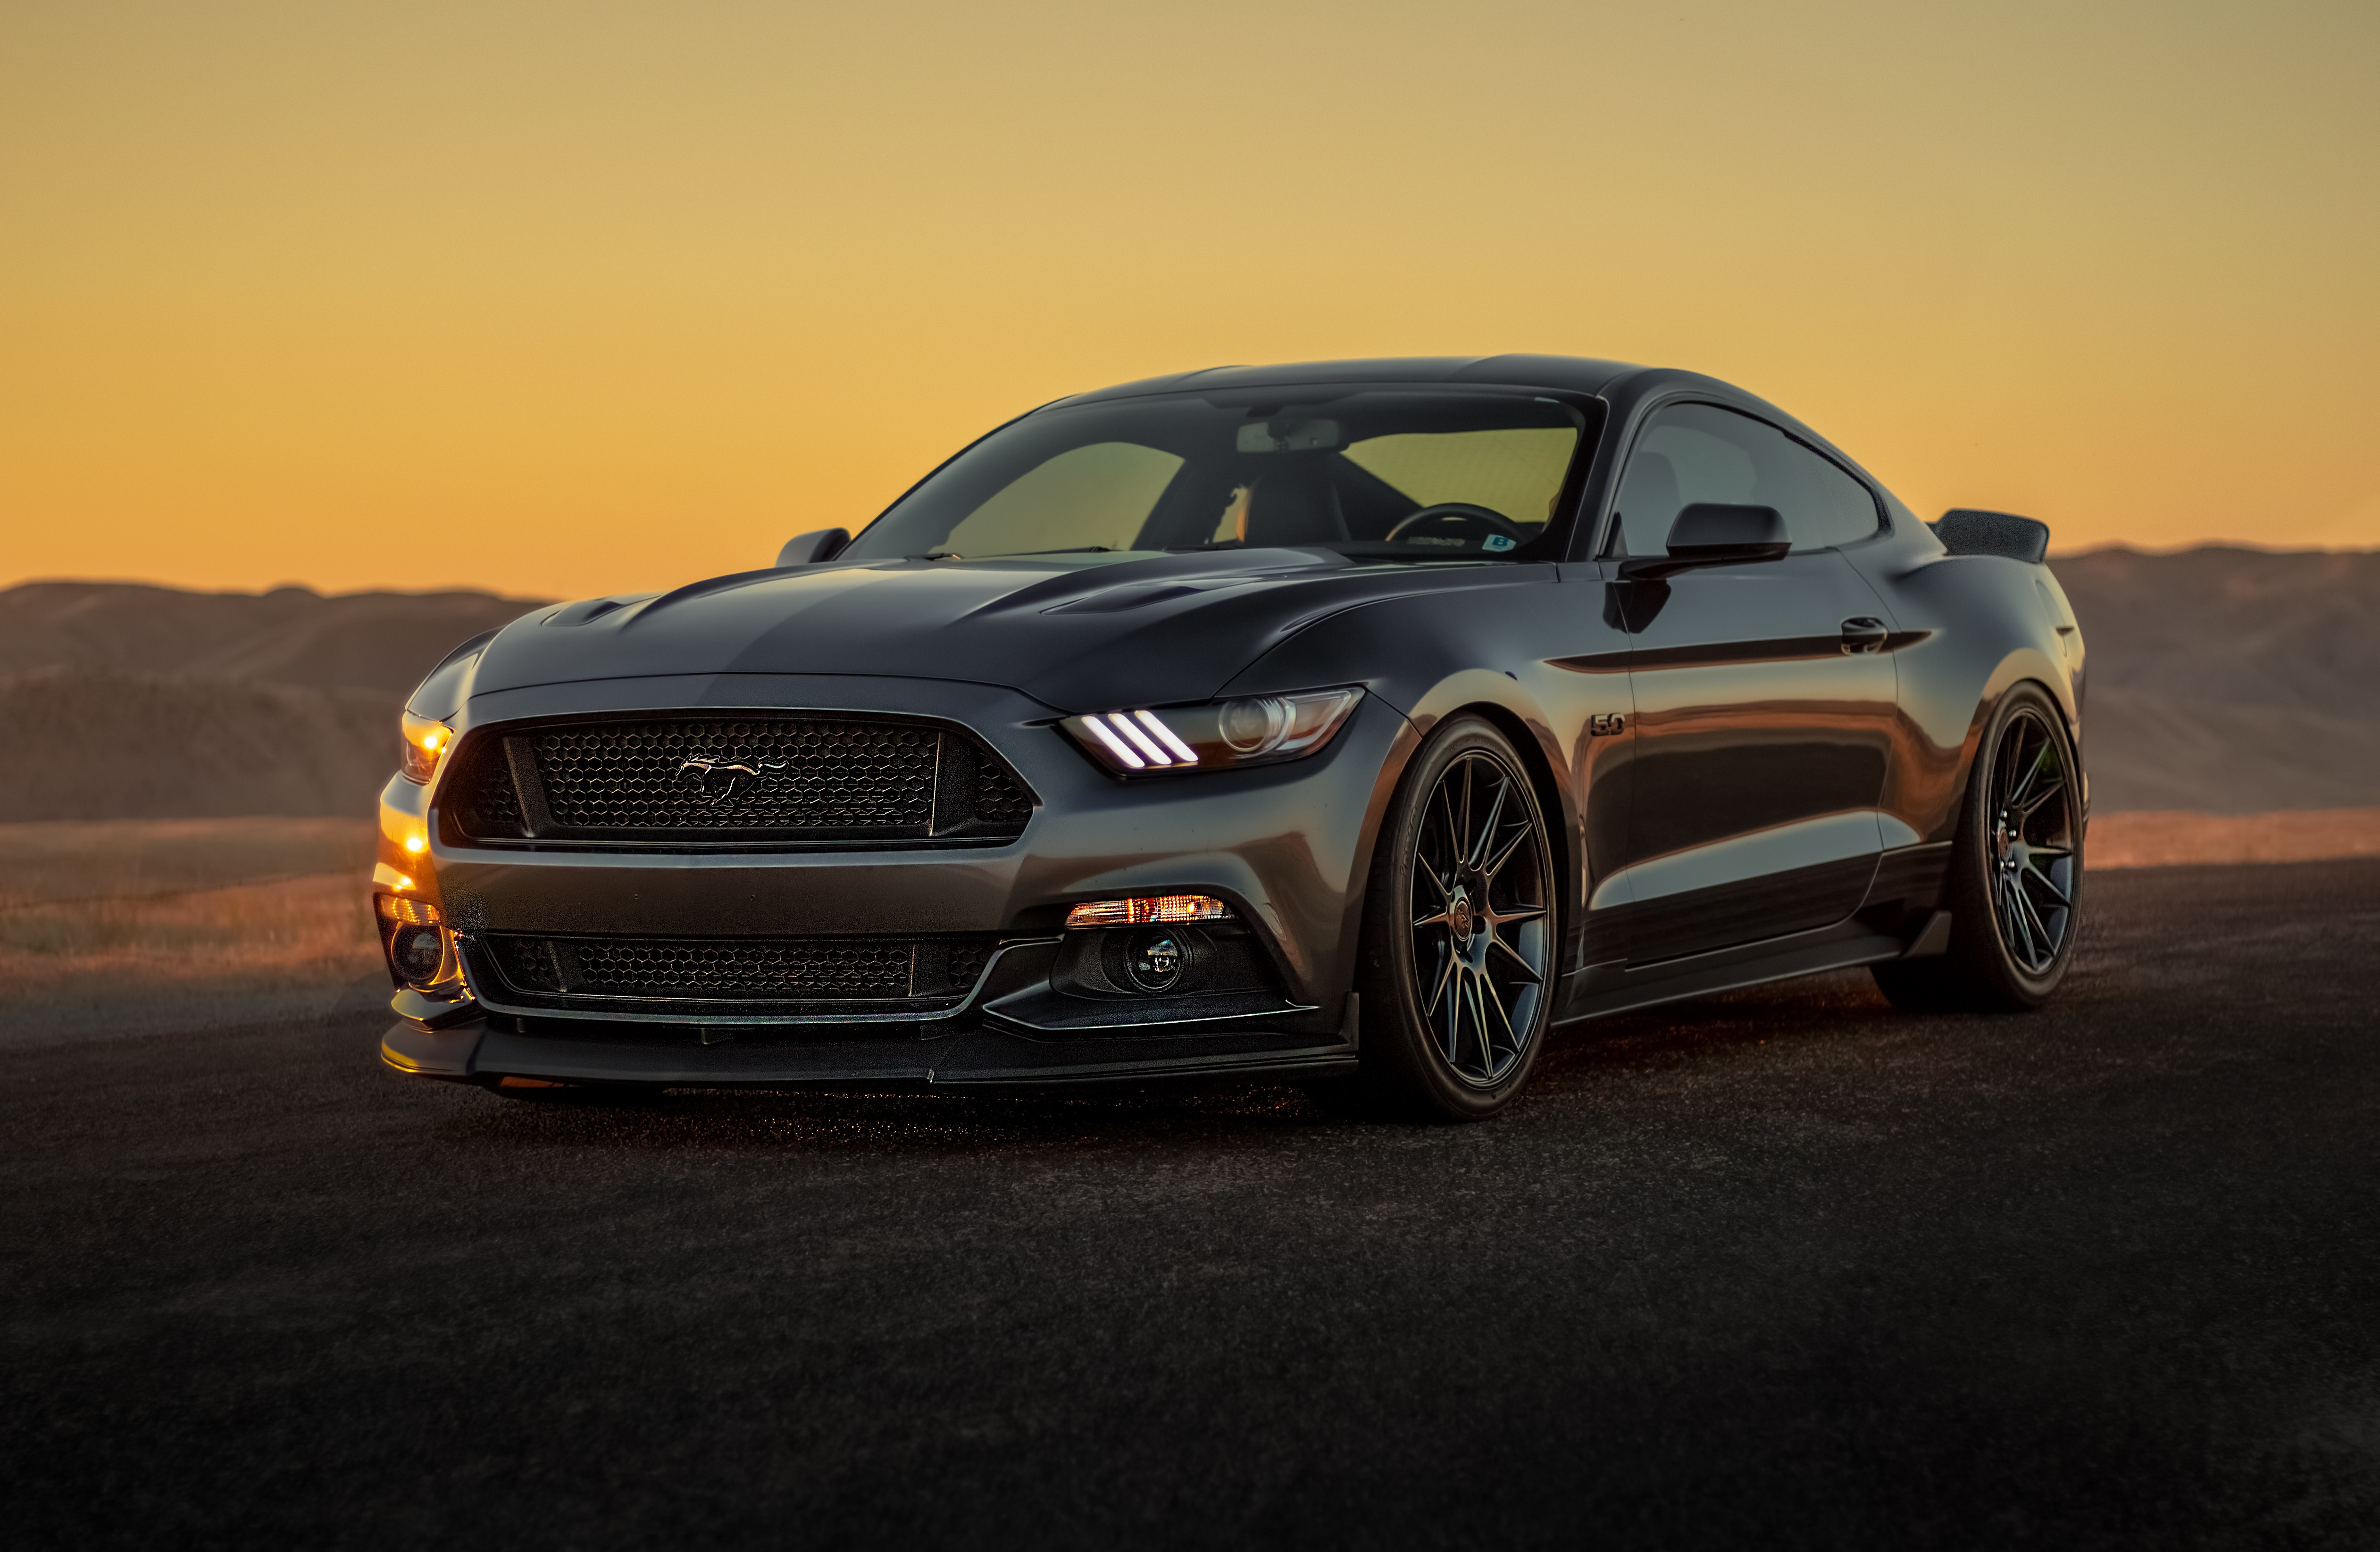 131336 скачать обои Ford Mustang, Закат, Форд (Ford), Тачки (Cars), Серый, Бампер - заставки и картинки бесплатно